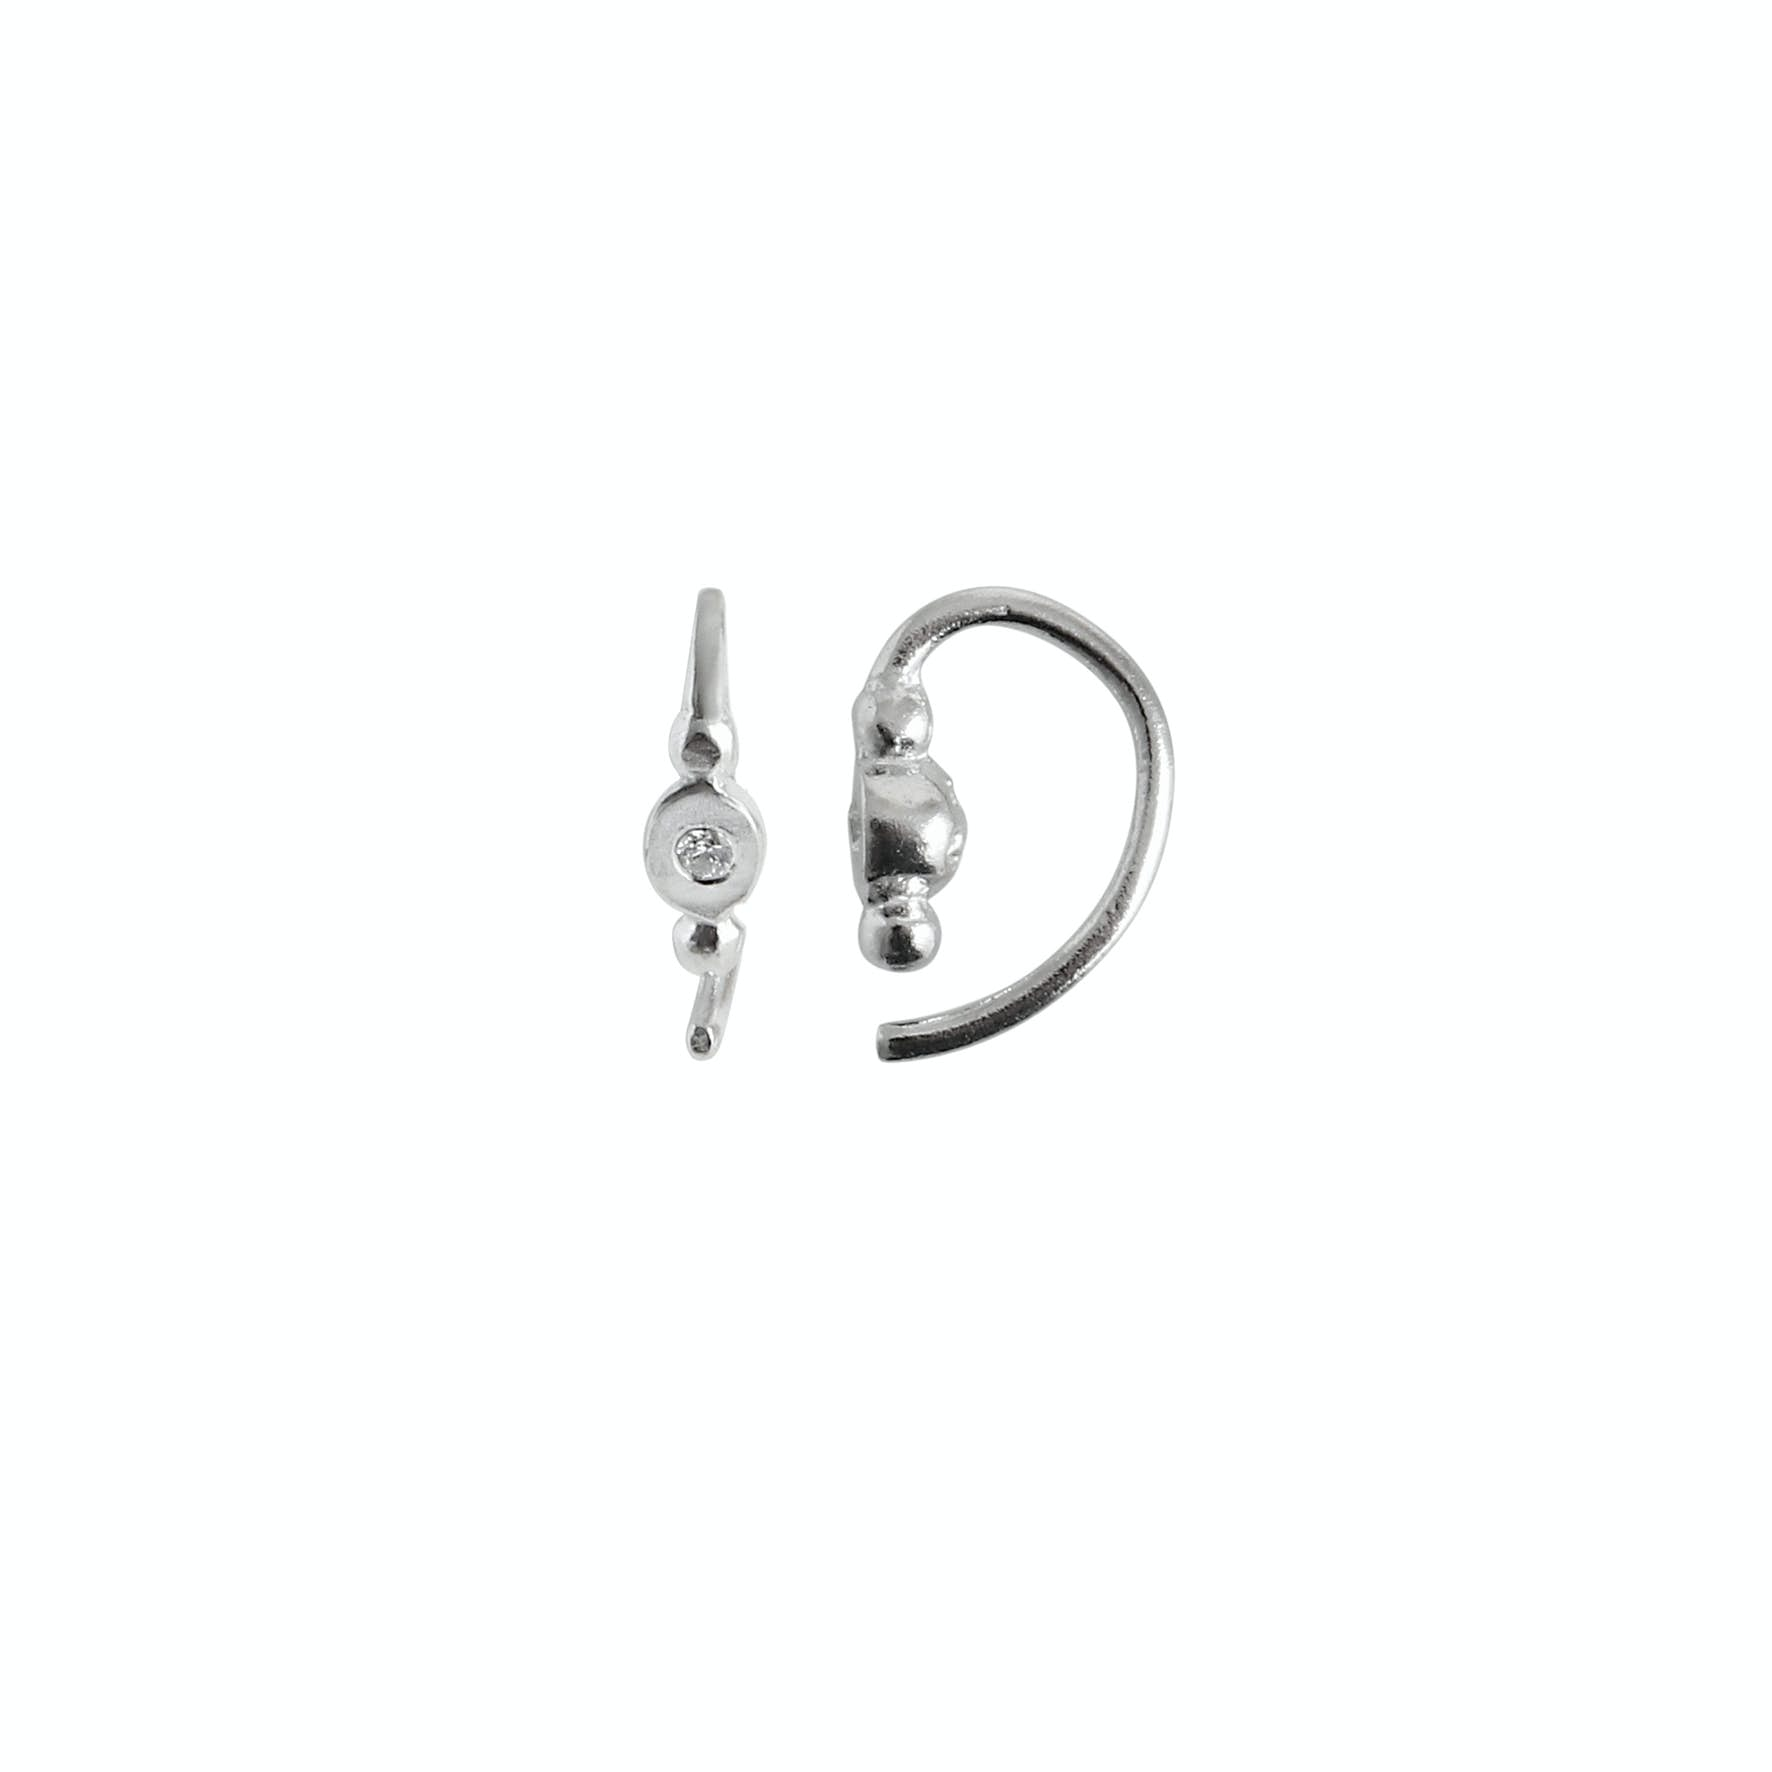 Petit Bon-Bon White Zircon Earring Piece von STINE A Jewelry in Silber Sterling 925